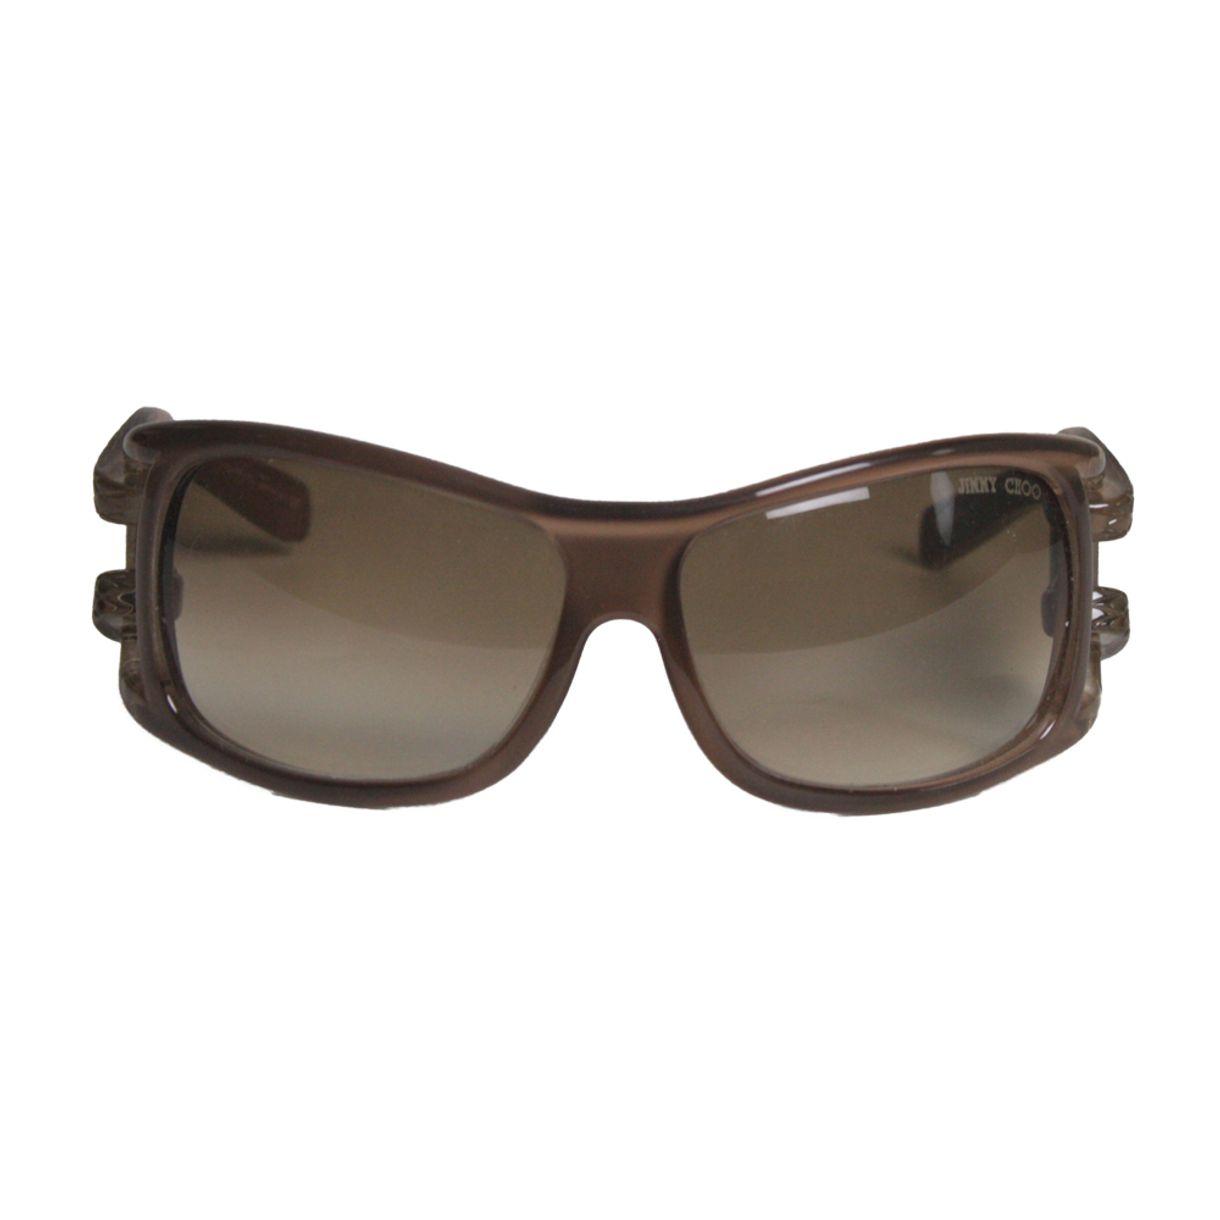 Oculos-Jimmy-Choo-135-JJ_S-Acetato-Rato